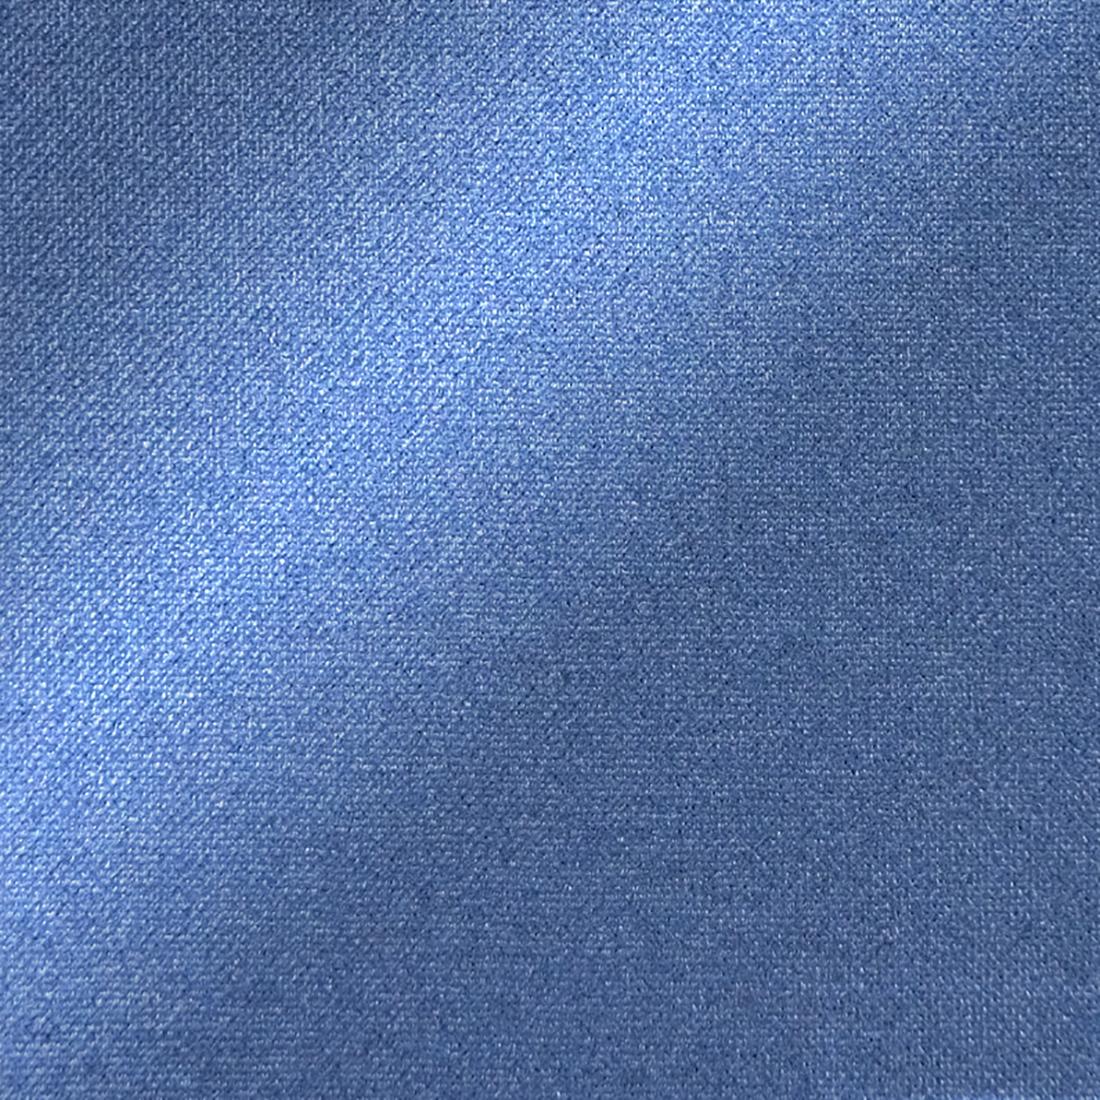 SchimmerndDunkelblau